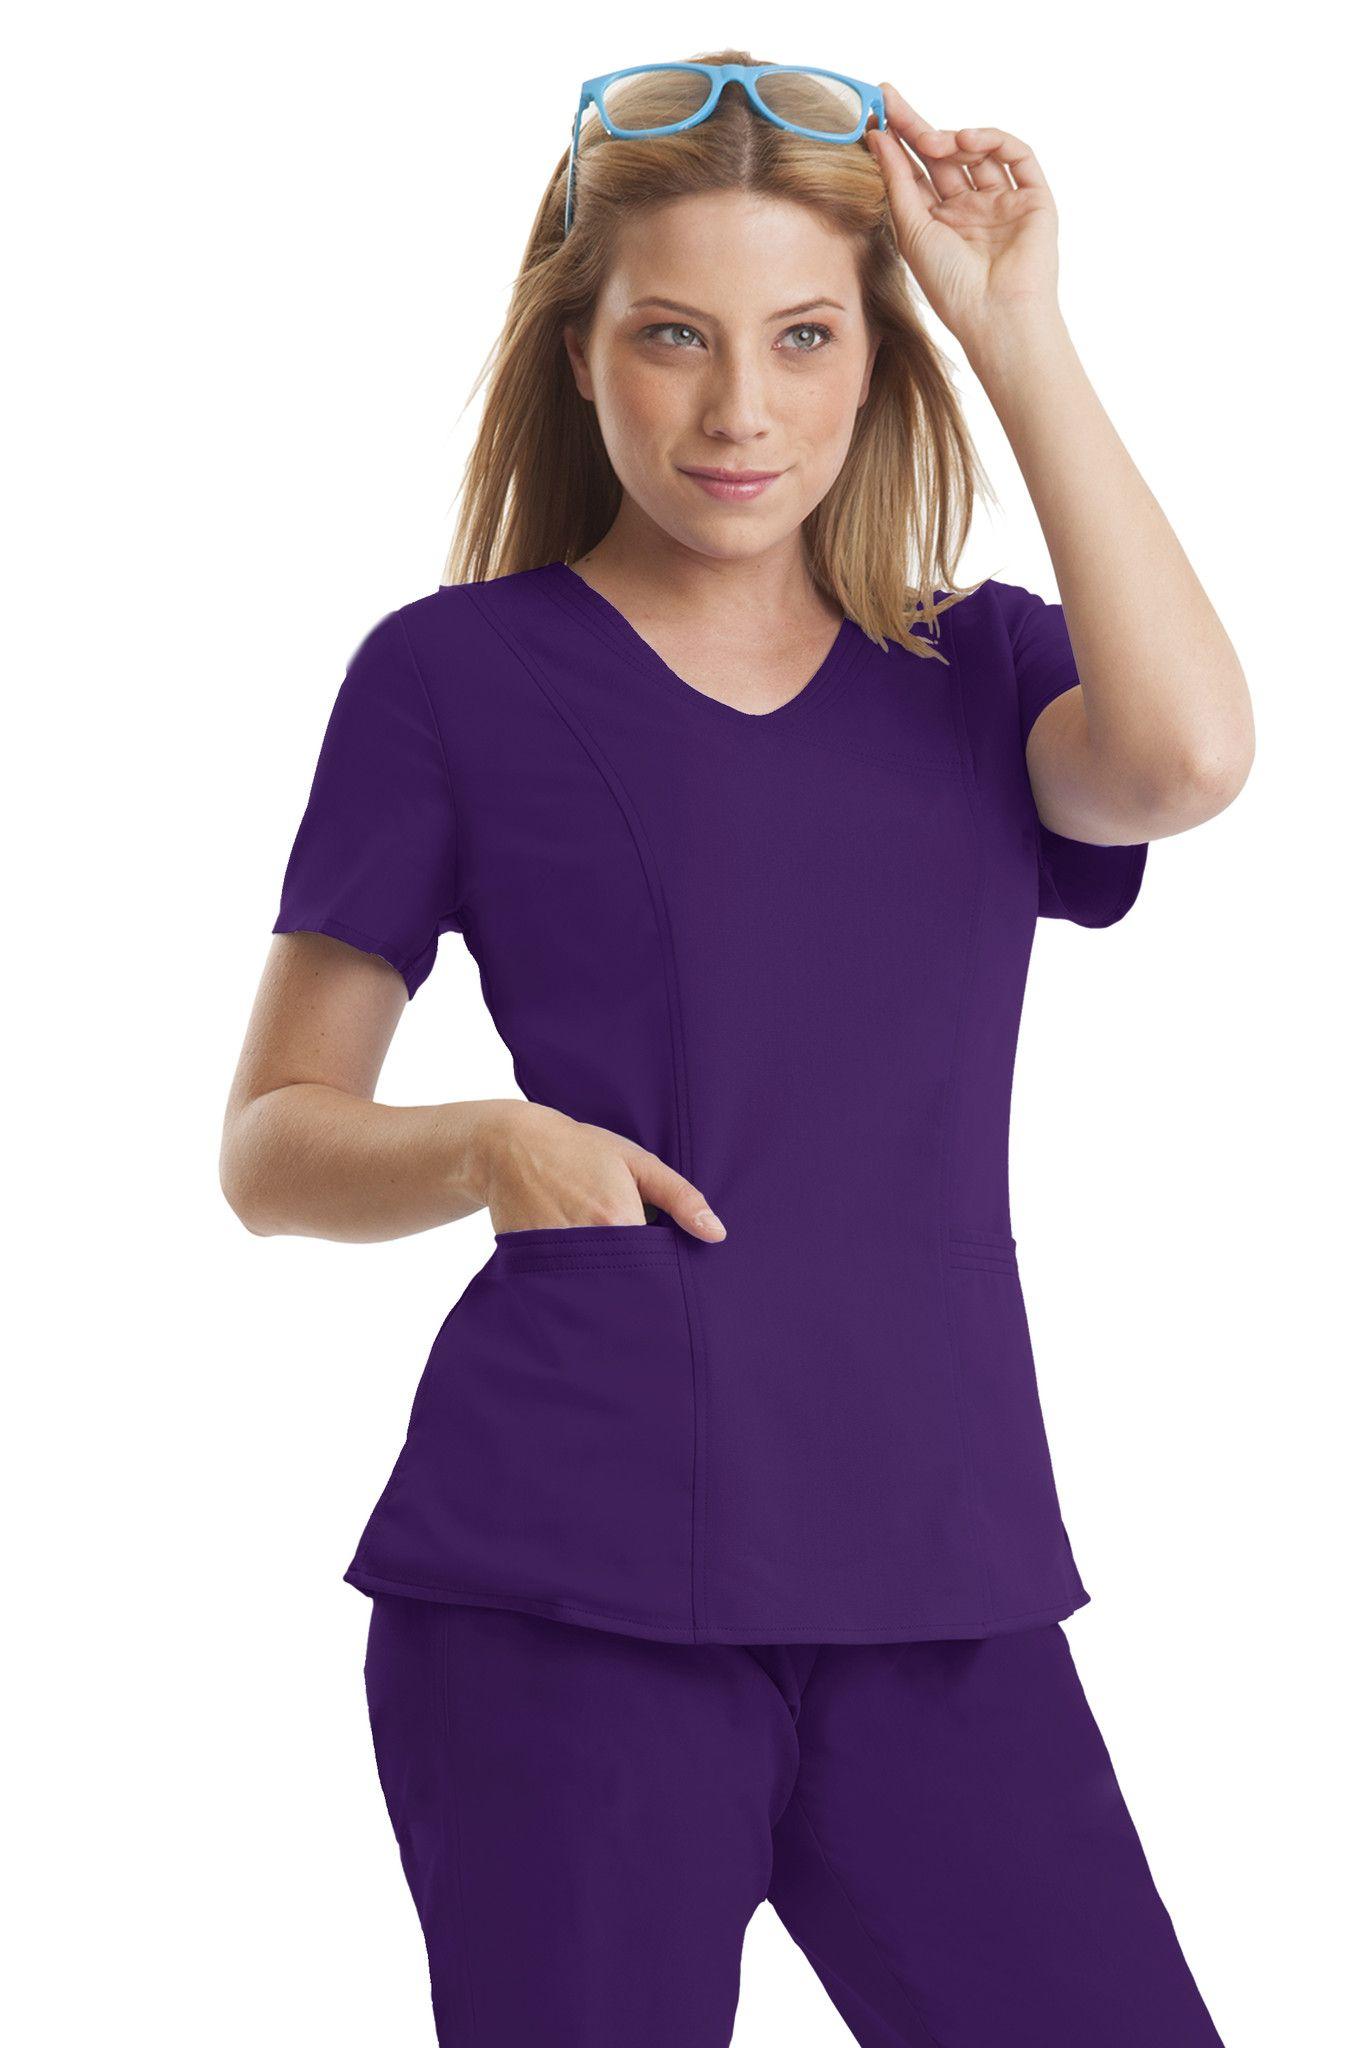 697dae10211 #nursing #fashion #nurselife #scrublife #colors #healinghands #purplelabel. Jordan  Top ...